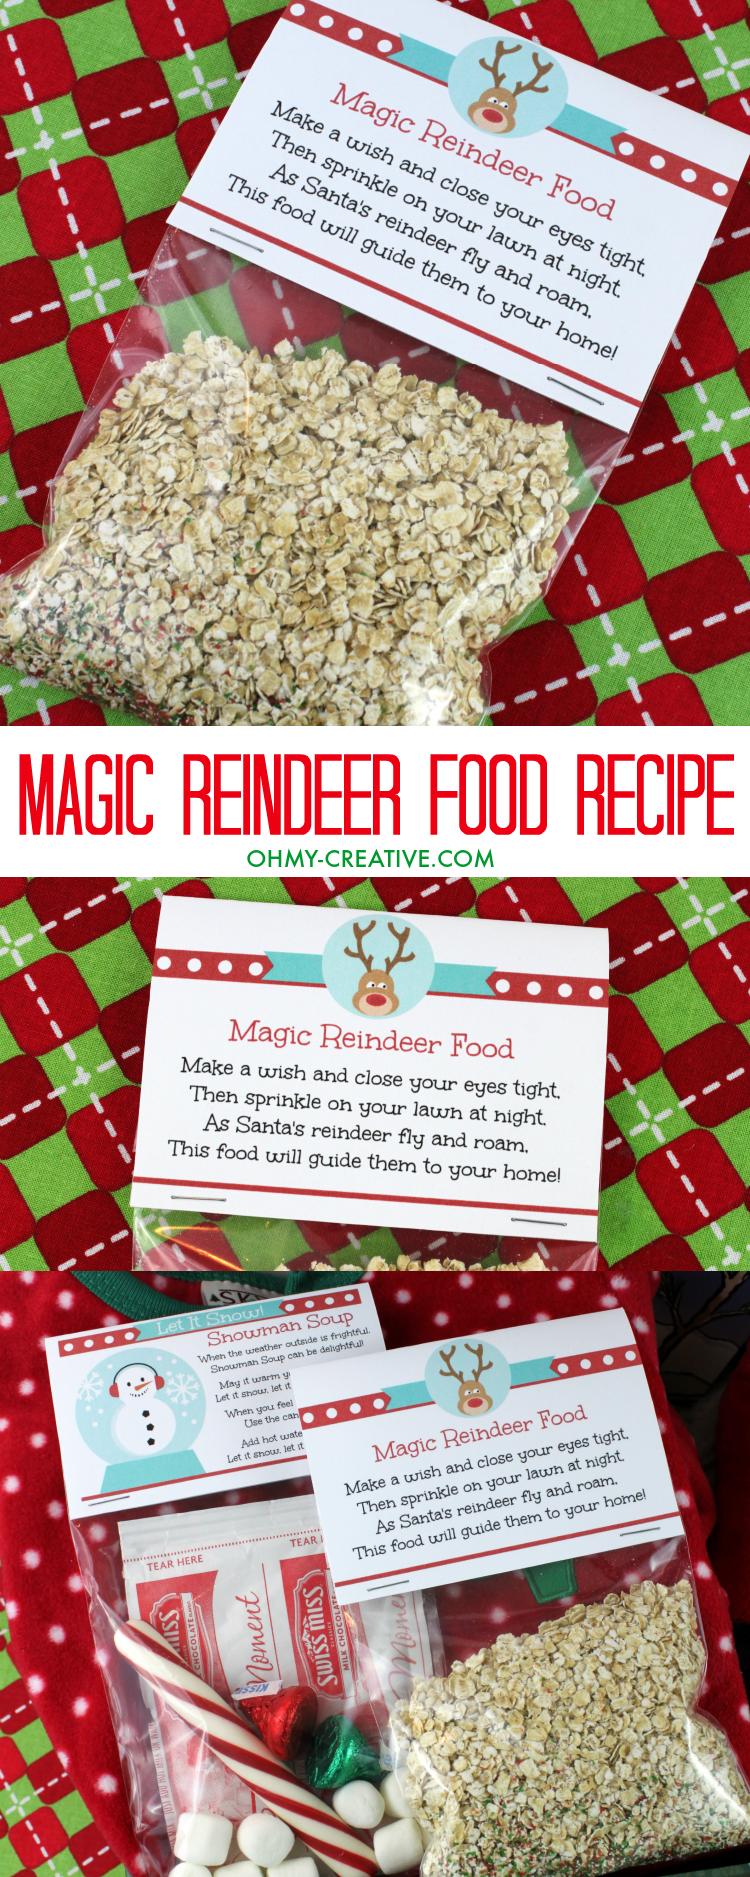 Magic Reindeer Food Recipe and printable bag topper.